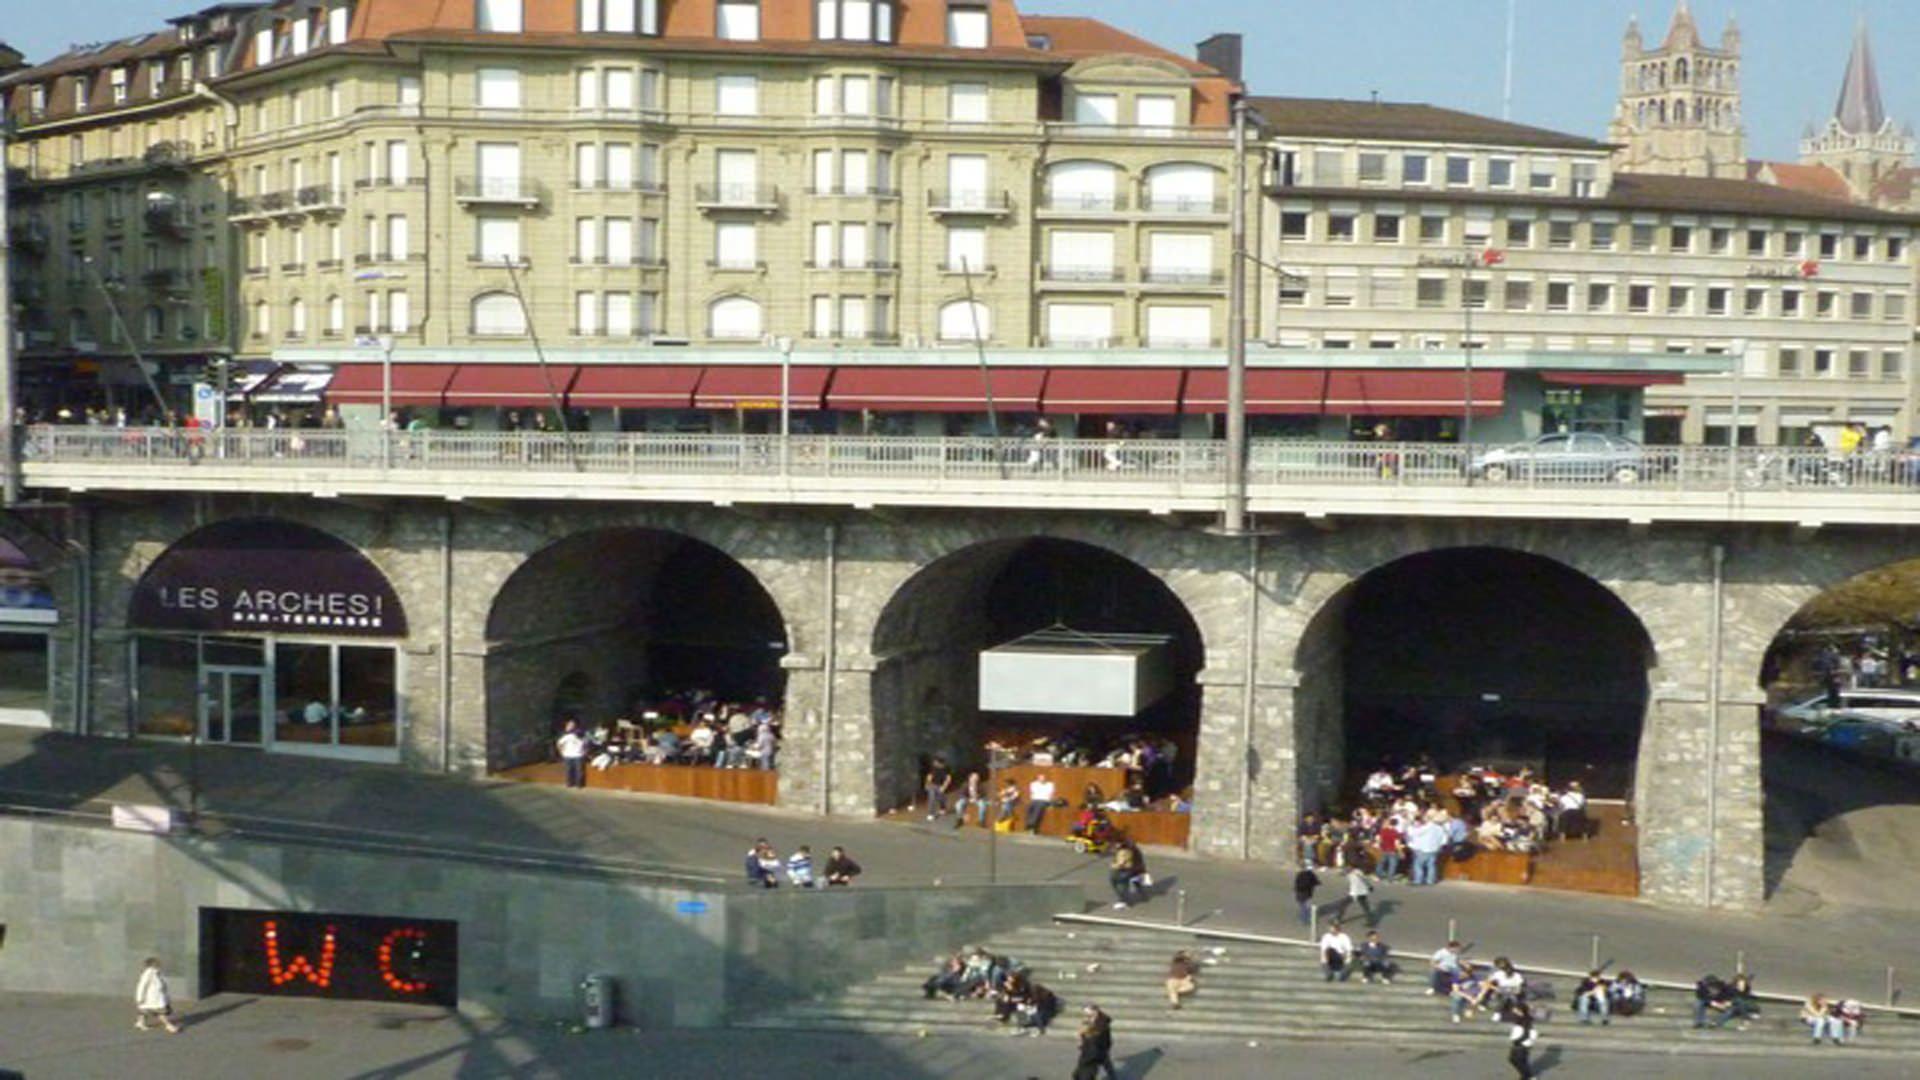 Swiss bureau interior design designed les arches lausanne